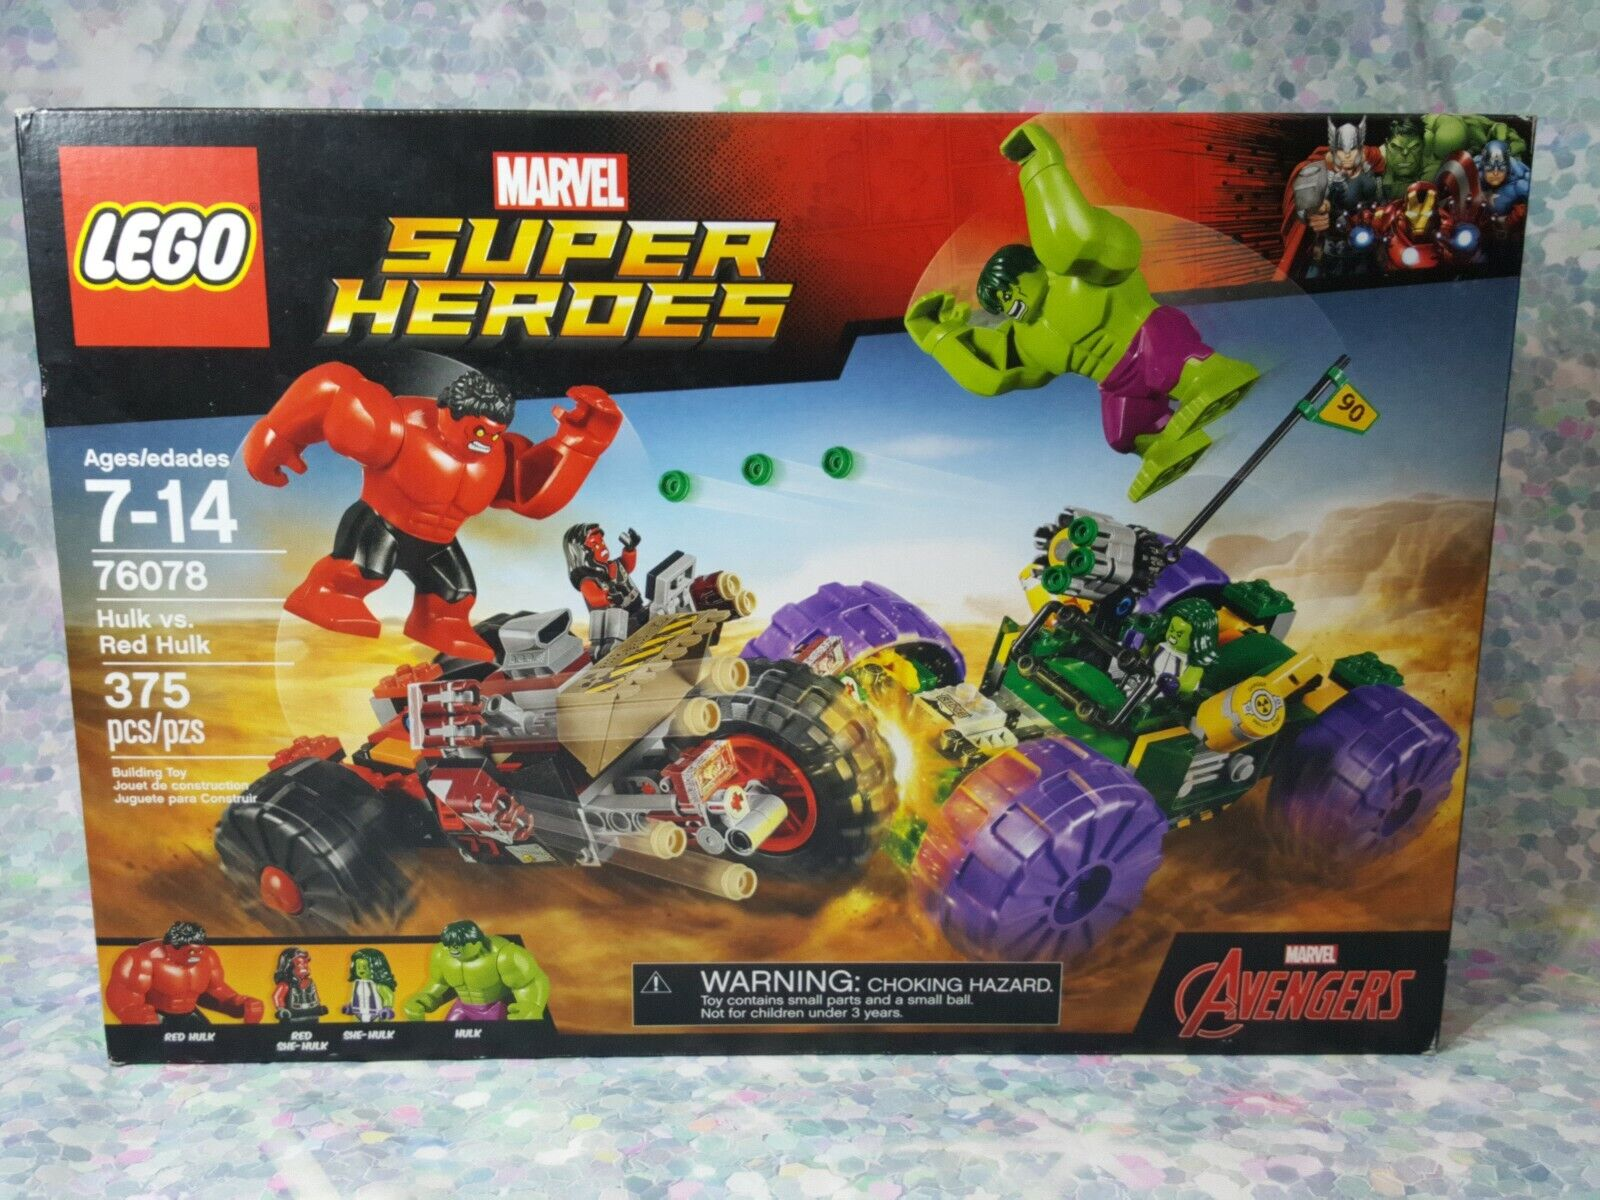 Red Hulk NO MINI FIGS // BOX LEGO 76078 Avengers Hulk vs Super Heroes